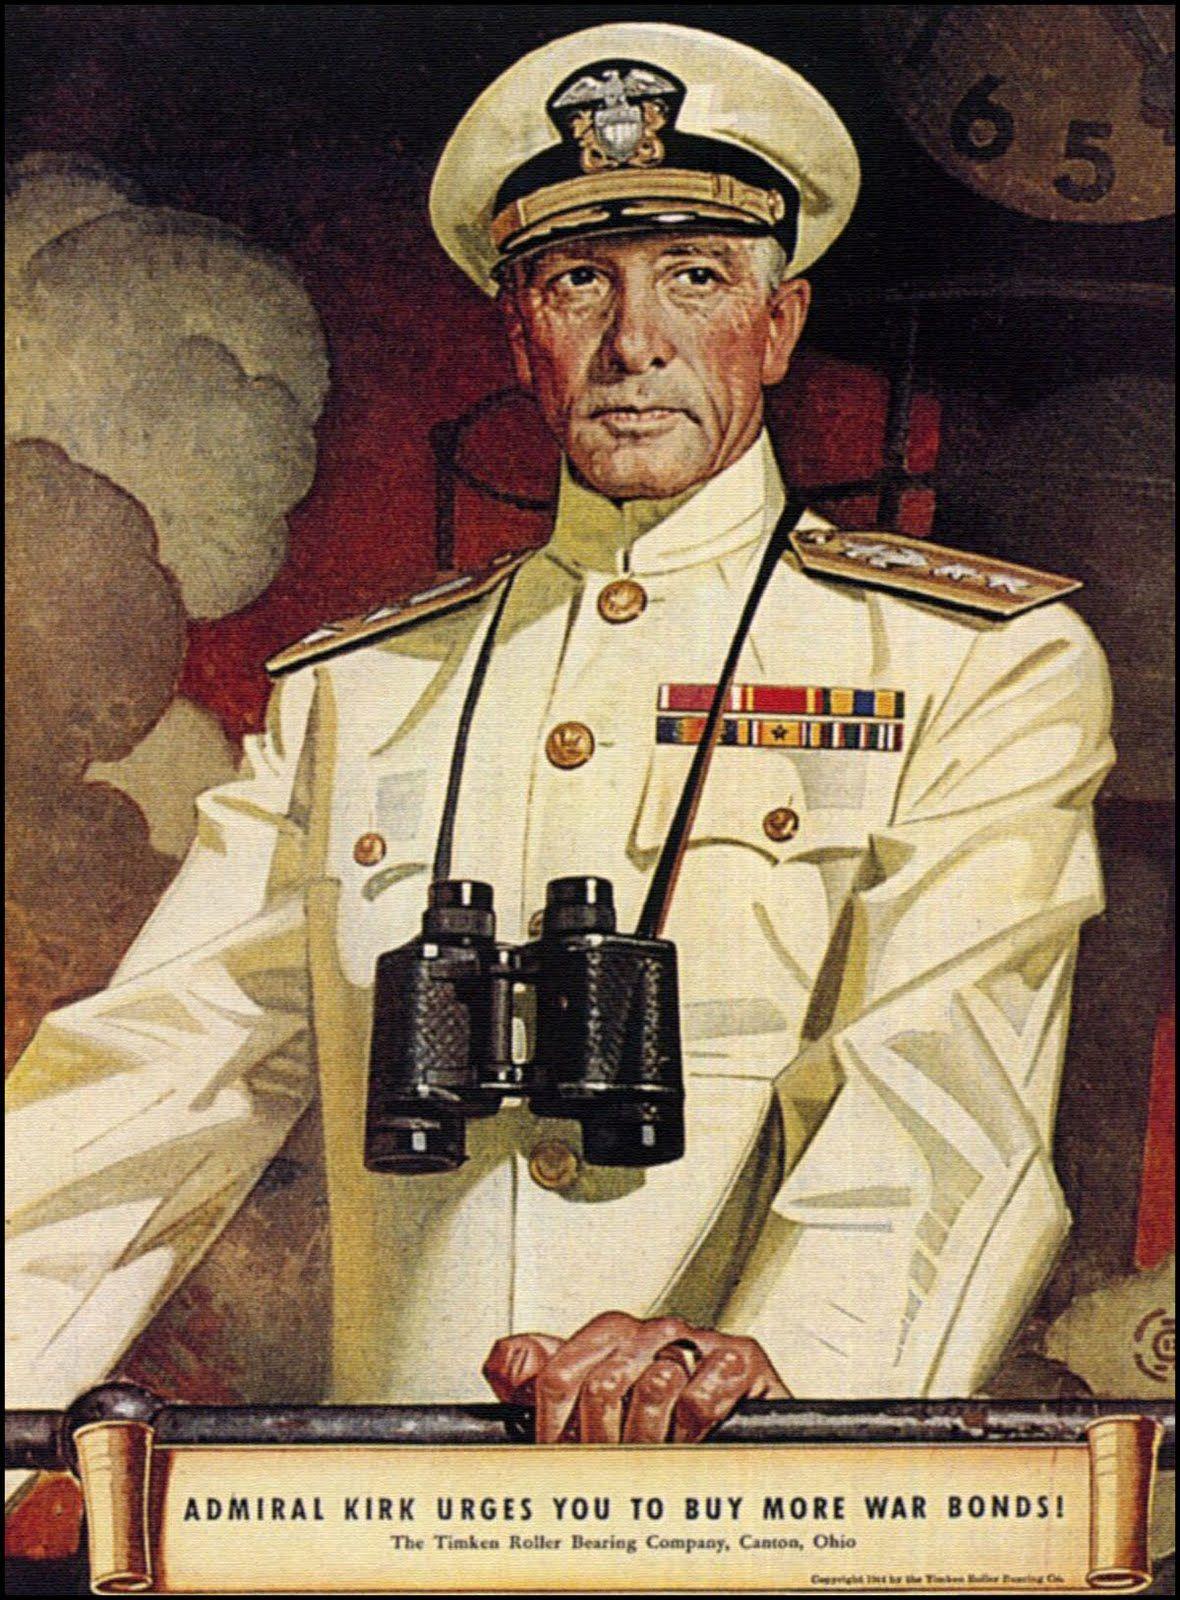 Jc leyendecker admiral kirk he reminds me of robert